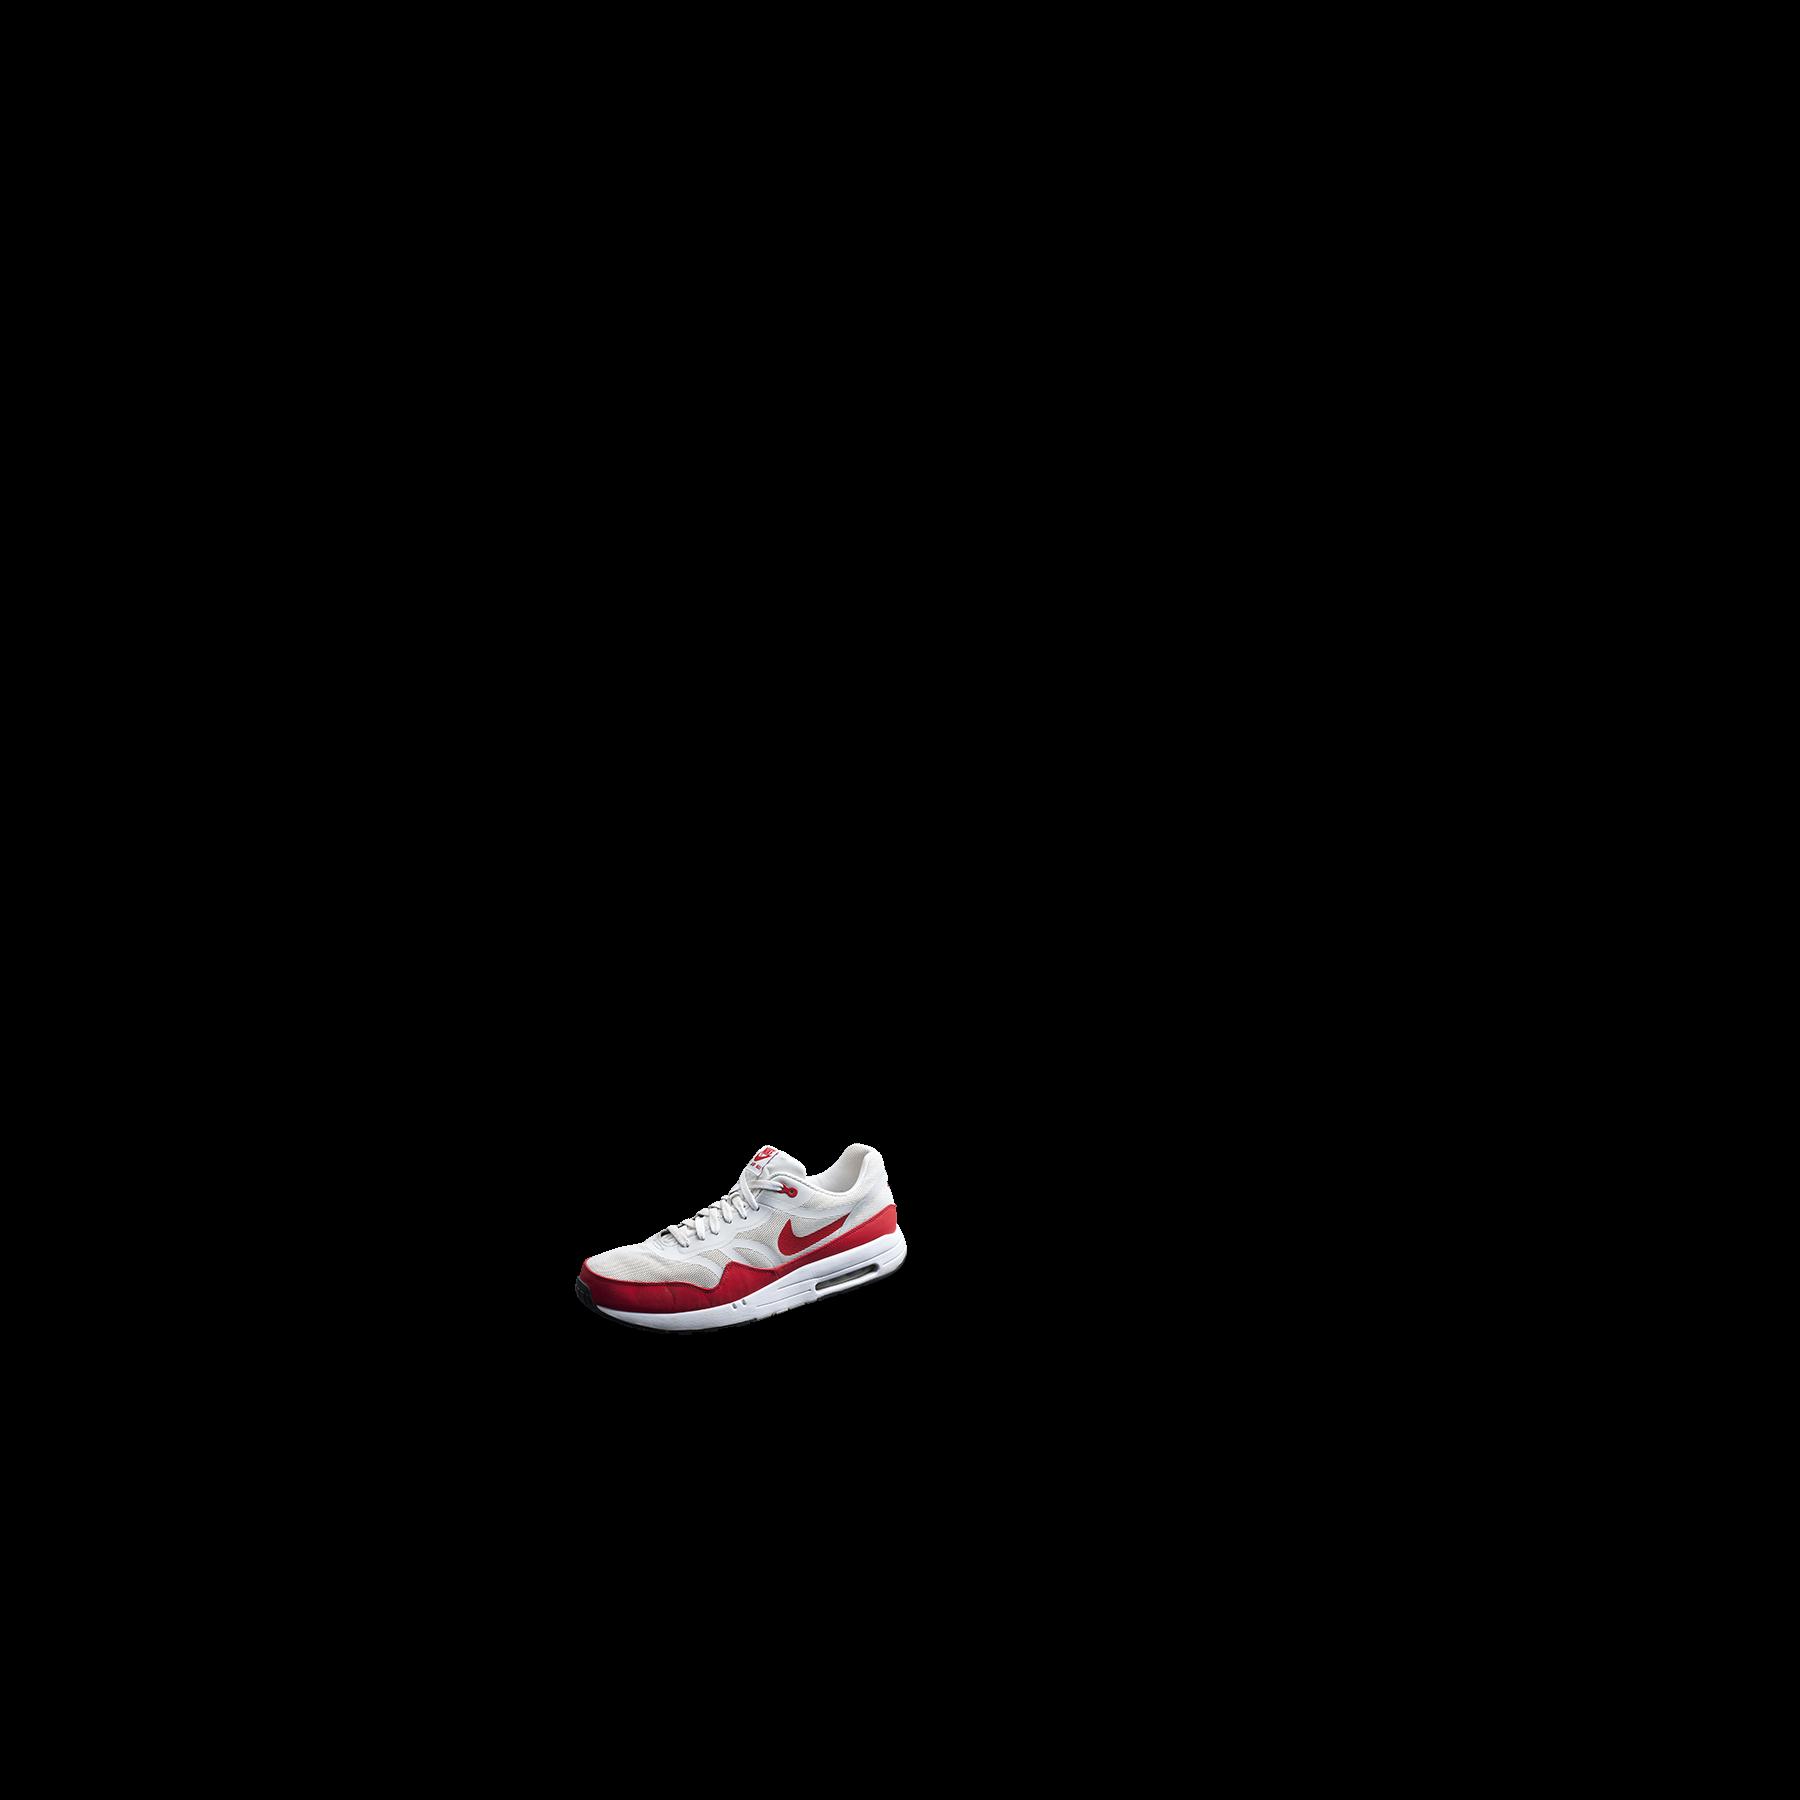 scarpa5